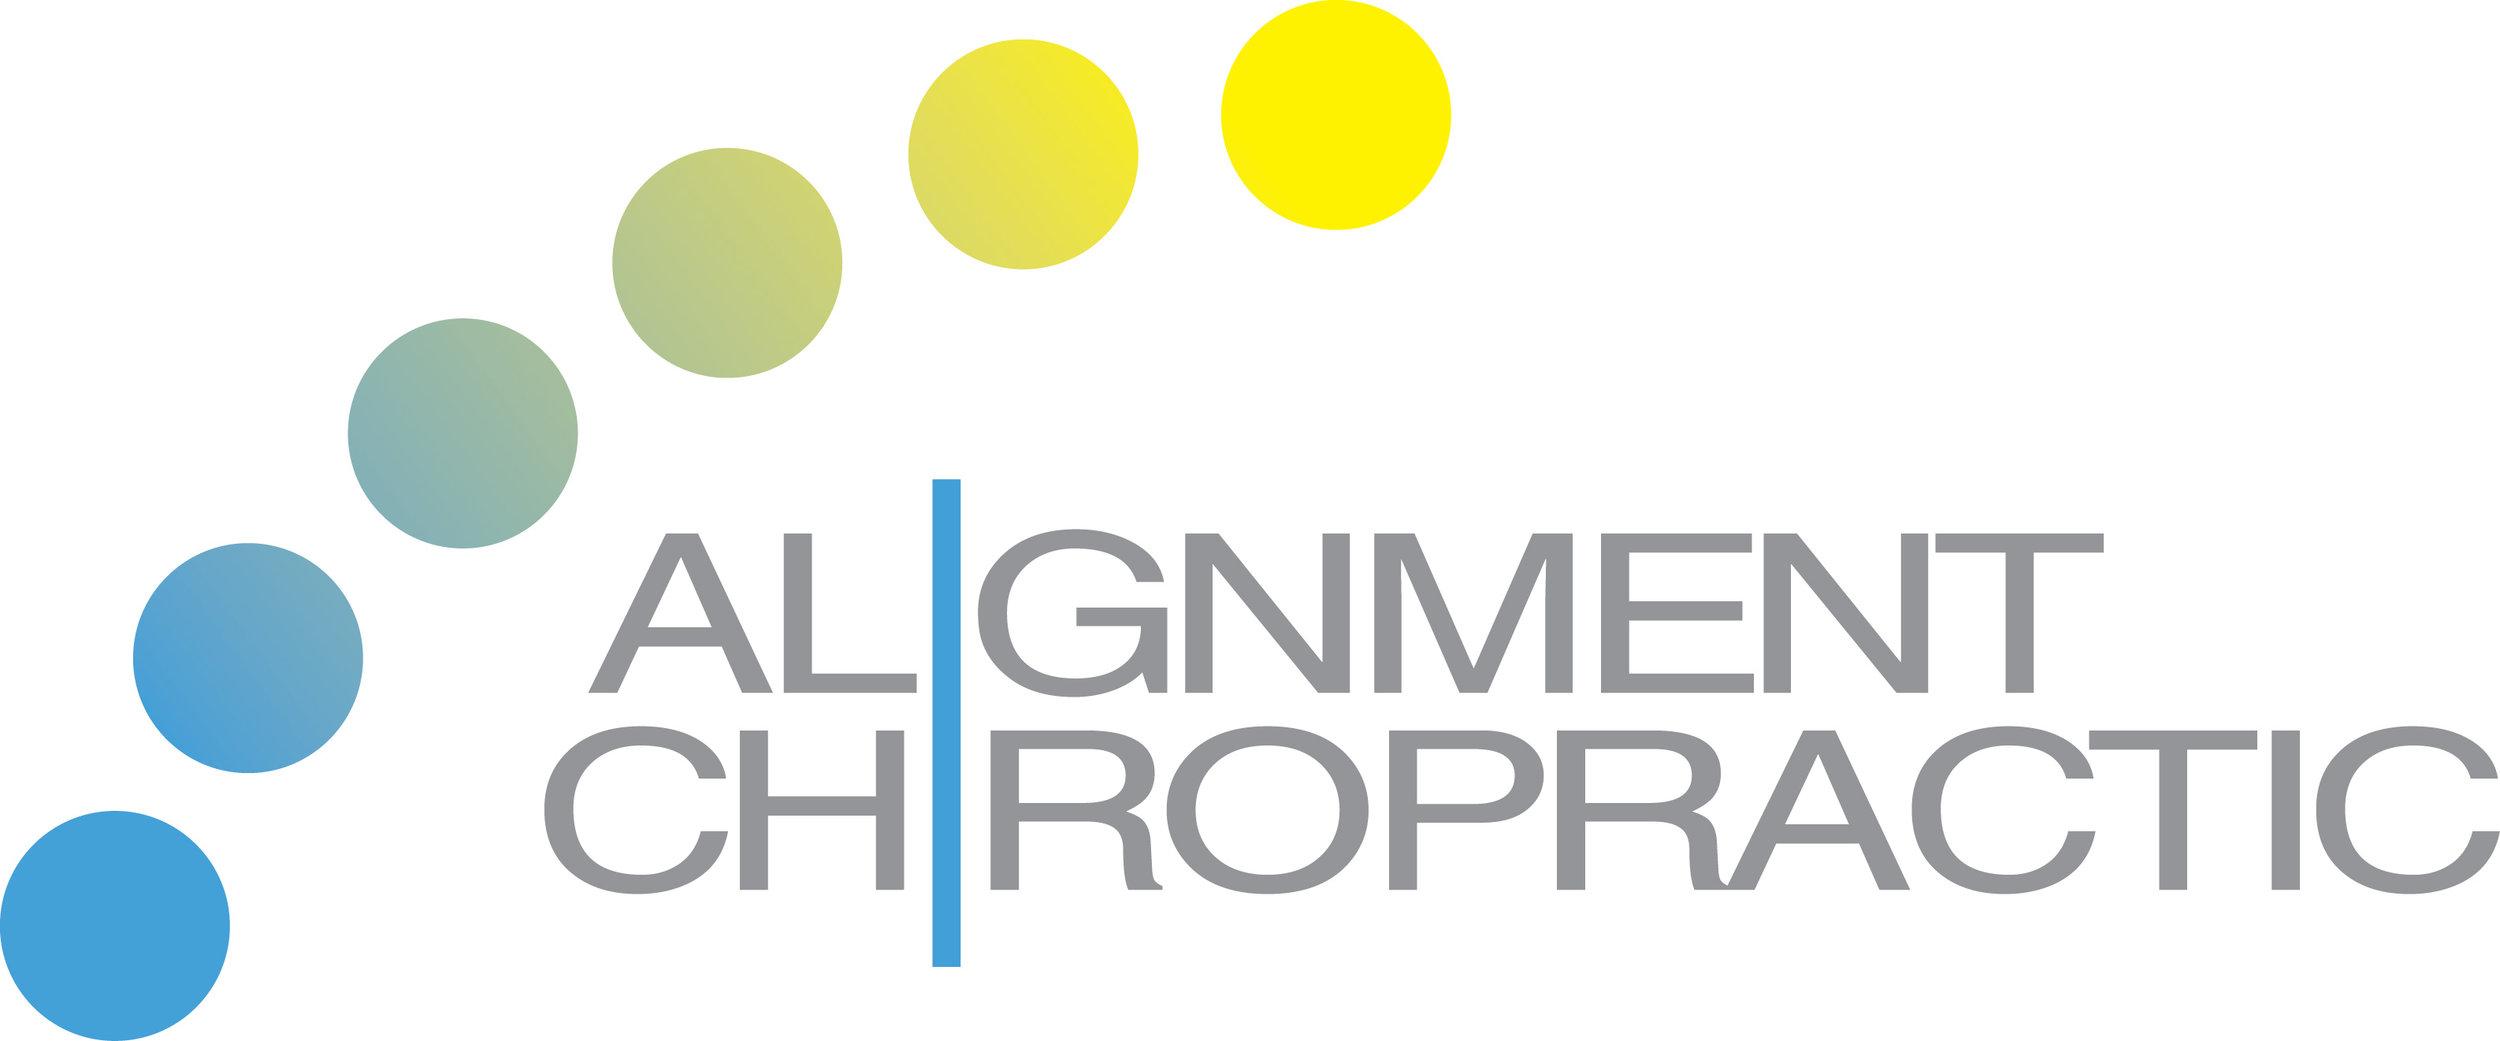 Alignment Chiropractic Logo HI.jpg